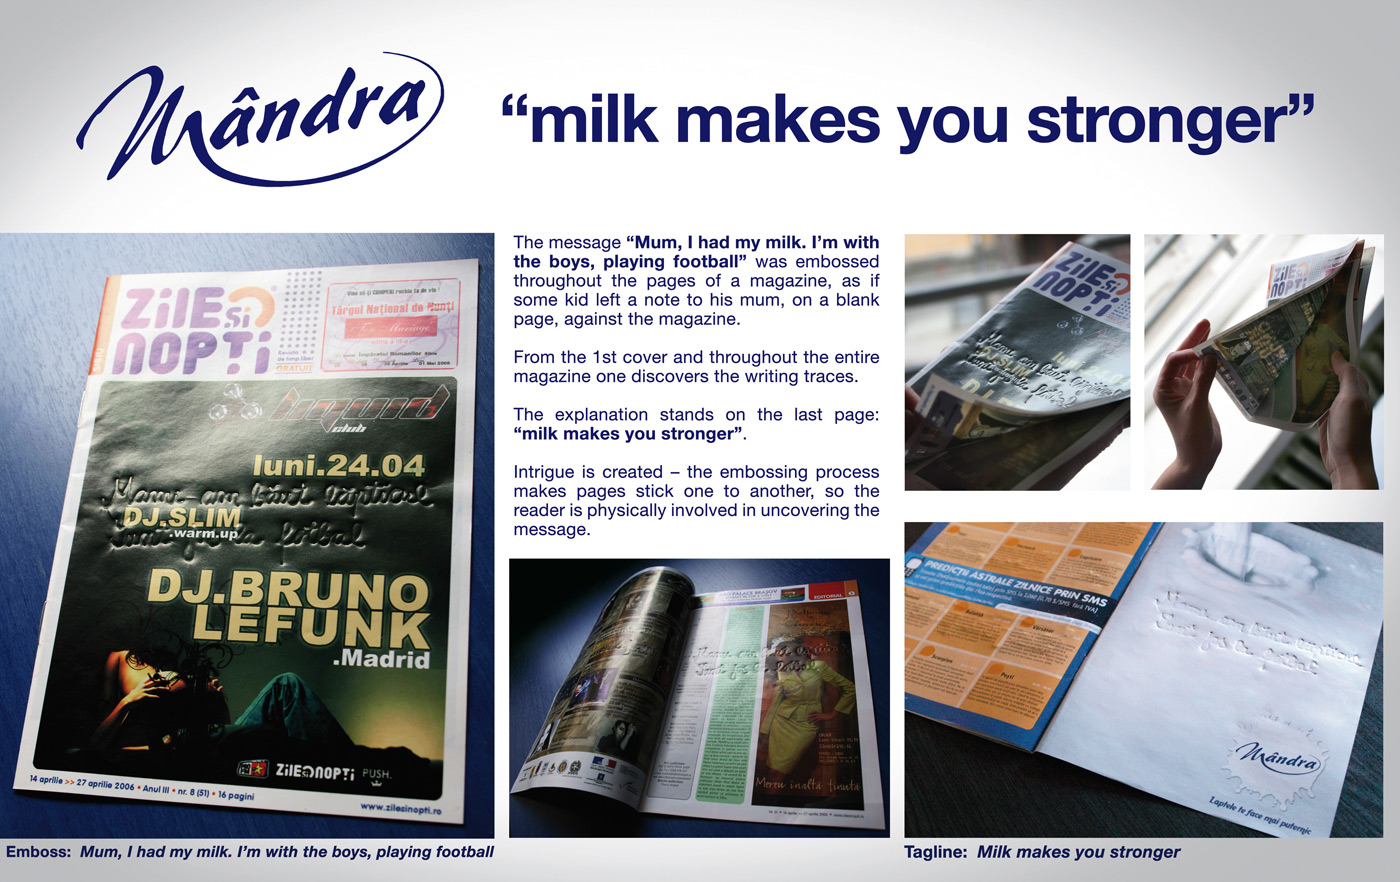 11-23-Guerilla_MilkStronger1.jpg